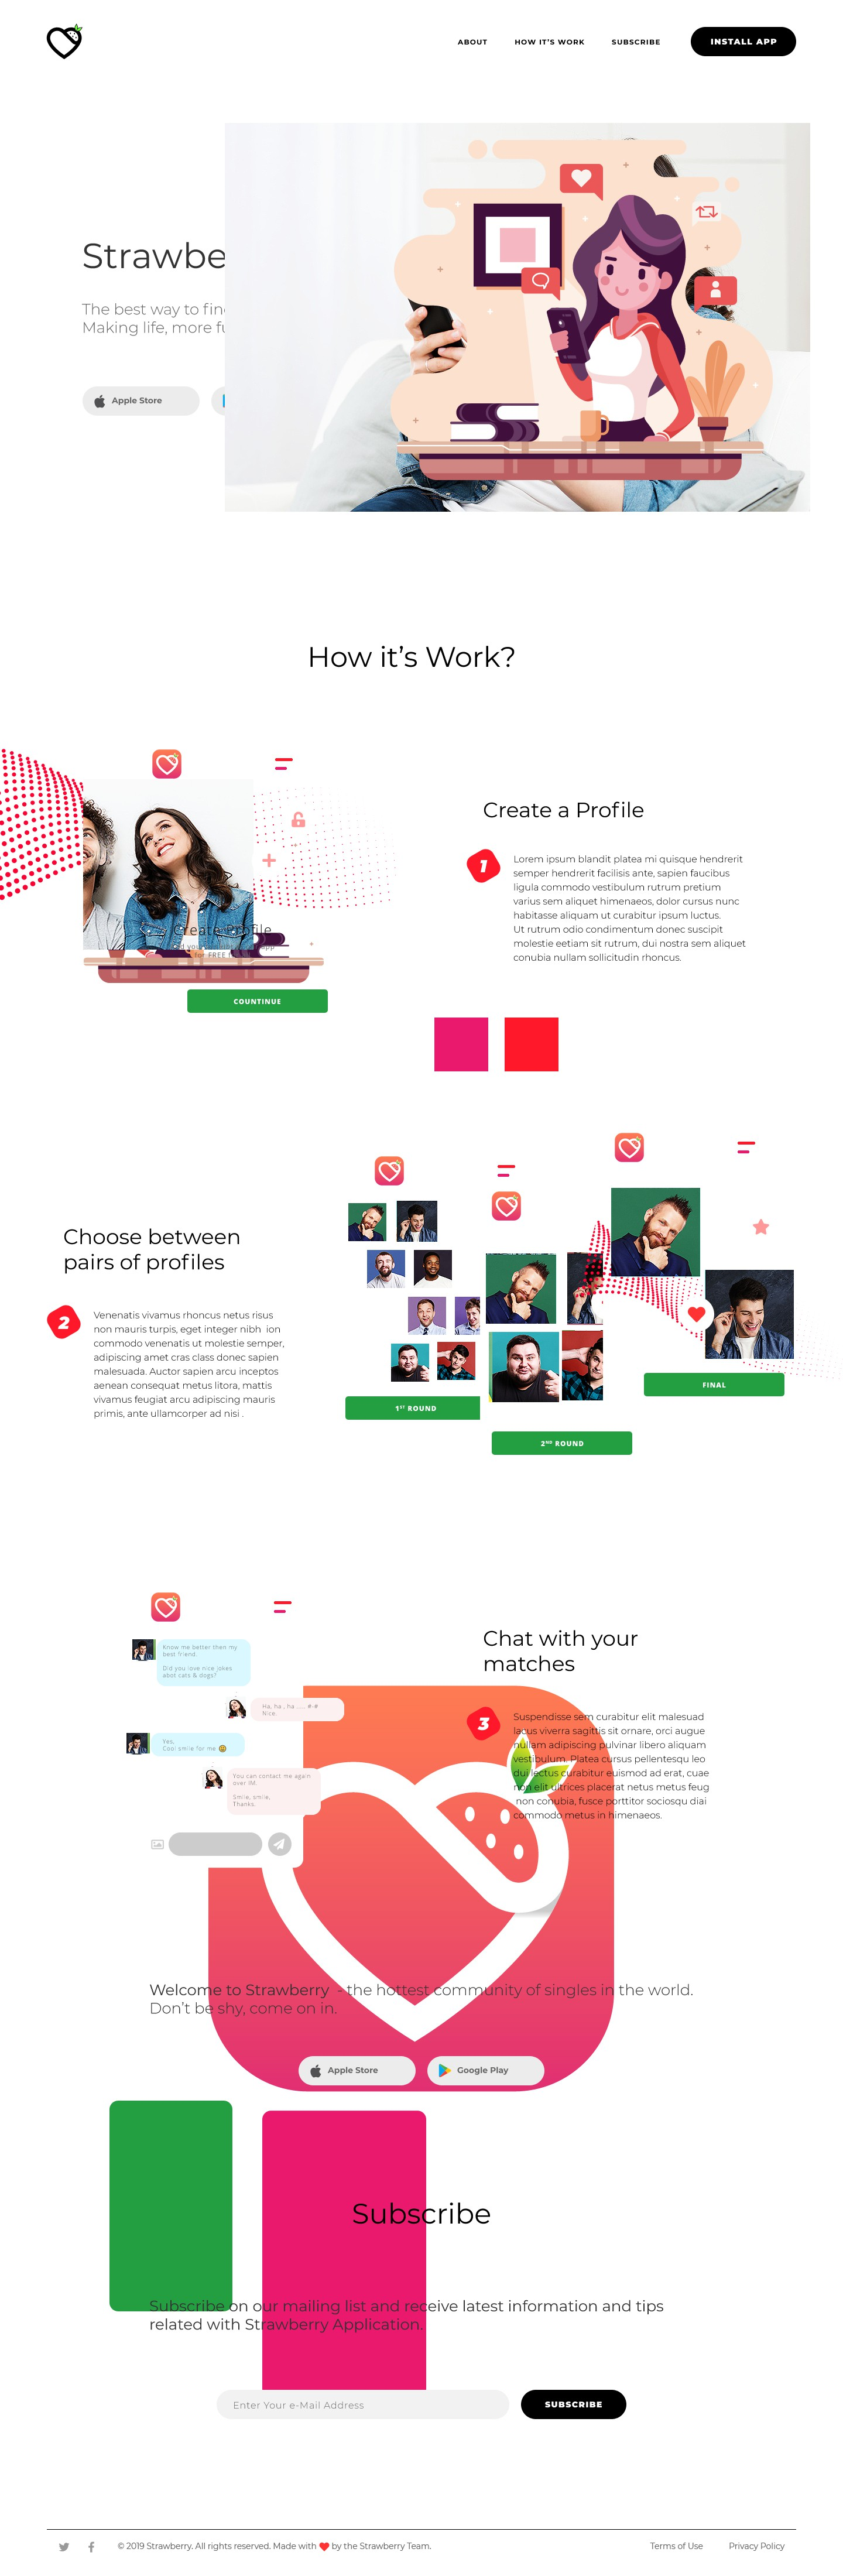 Strawberry Dating Marketing Page